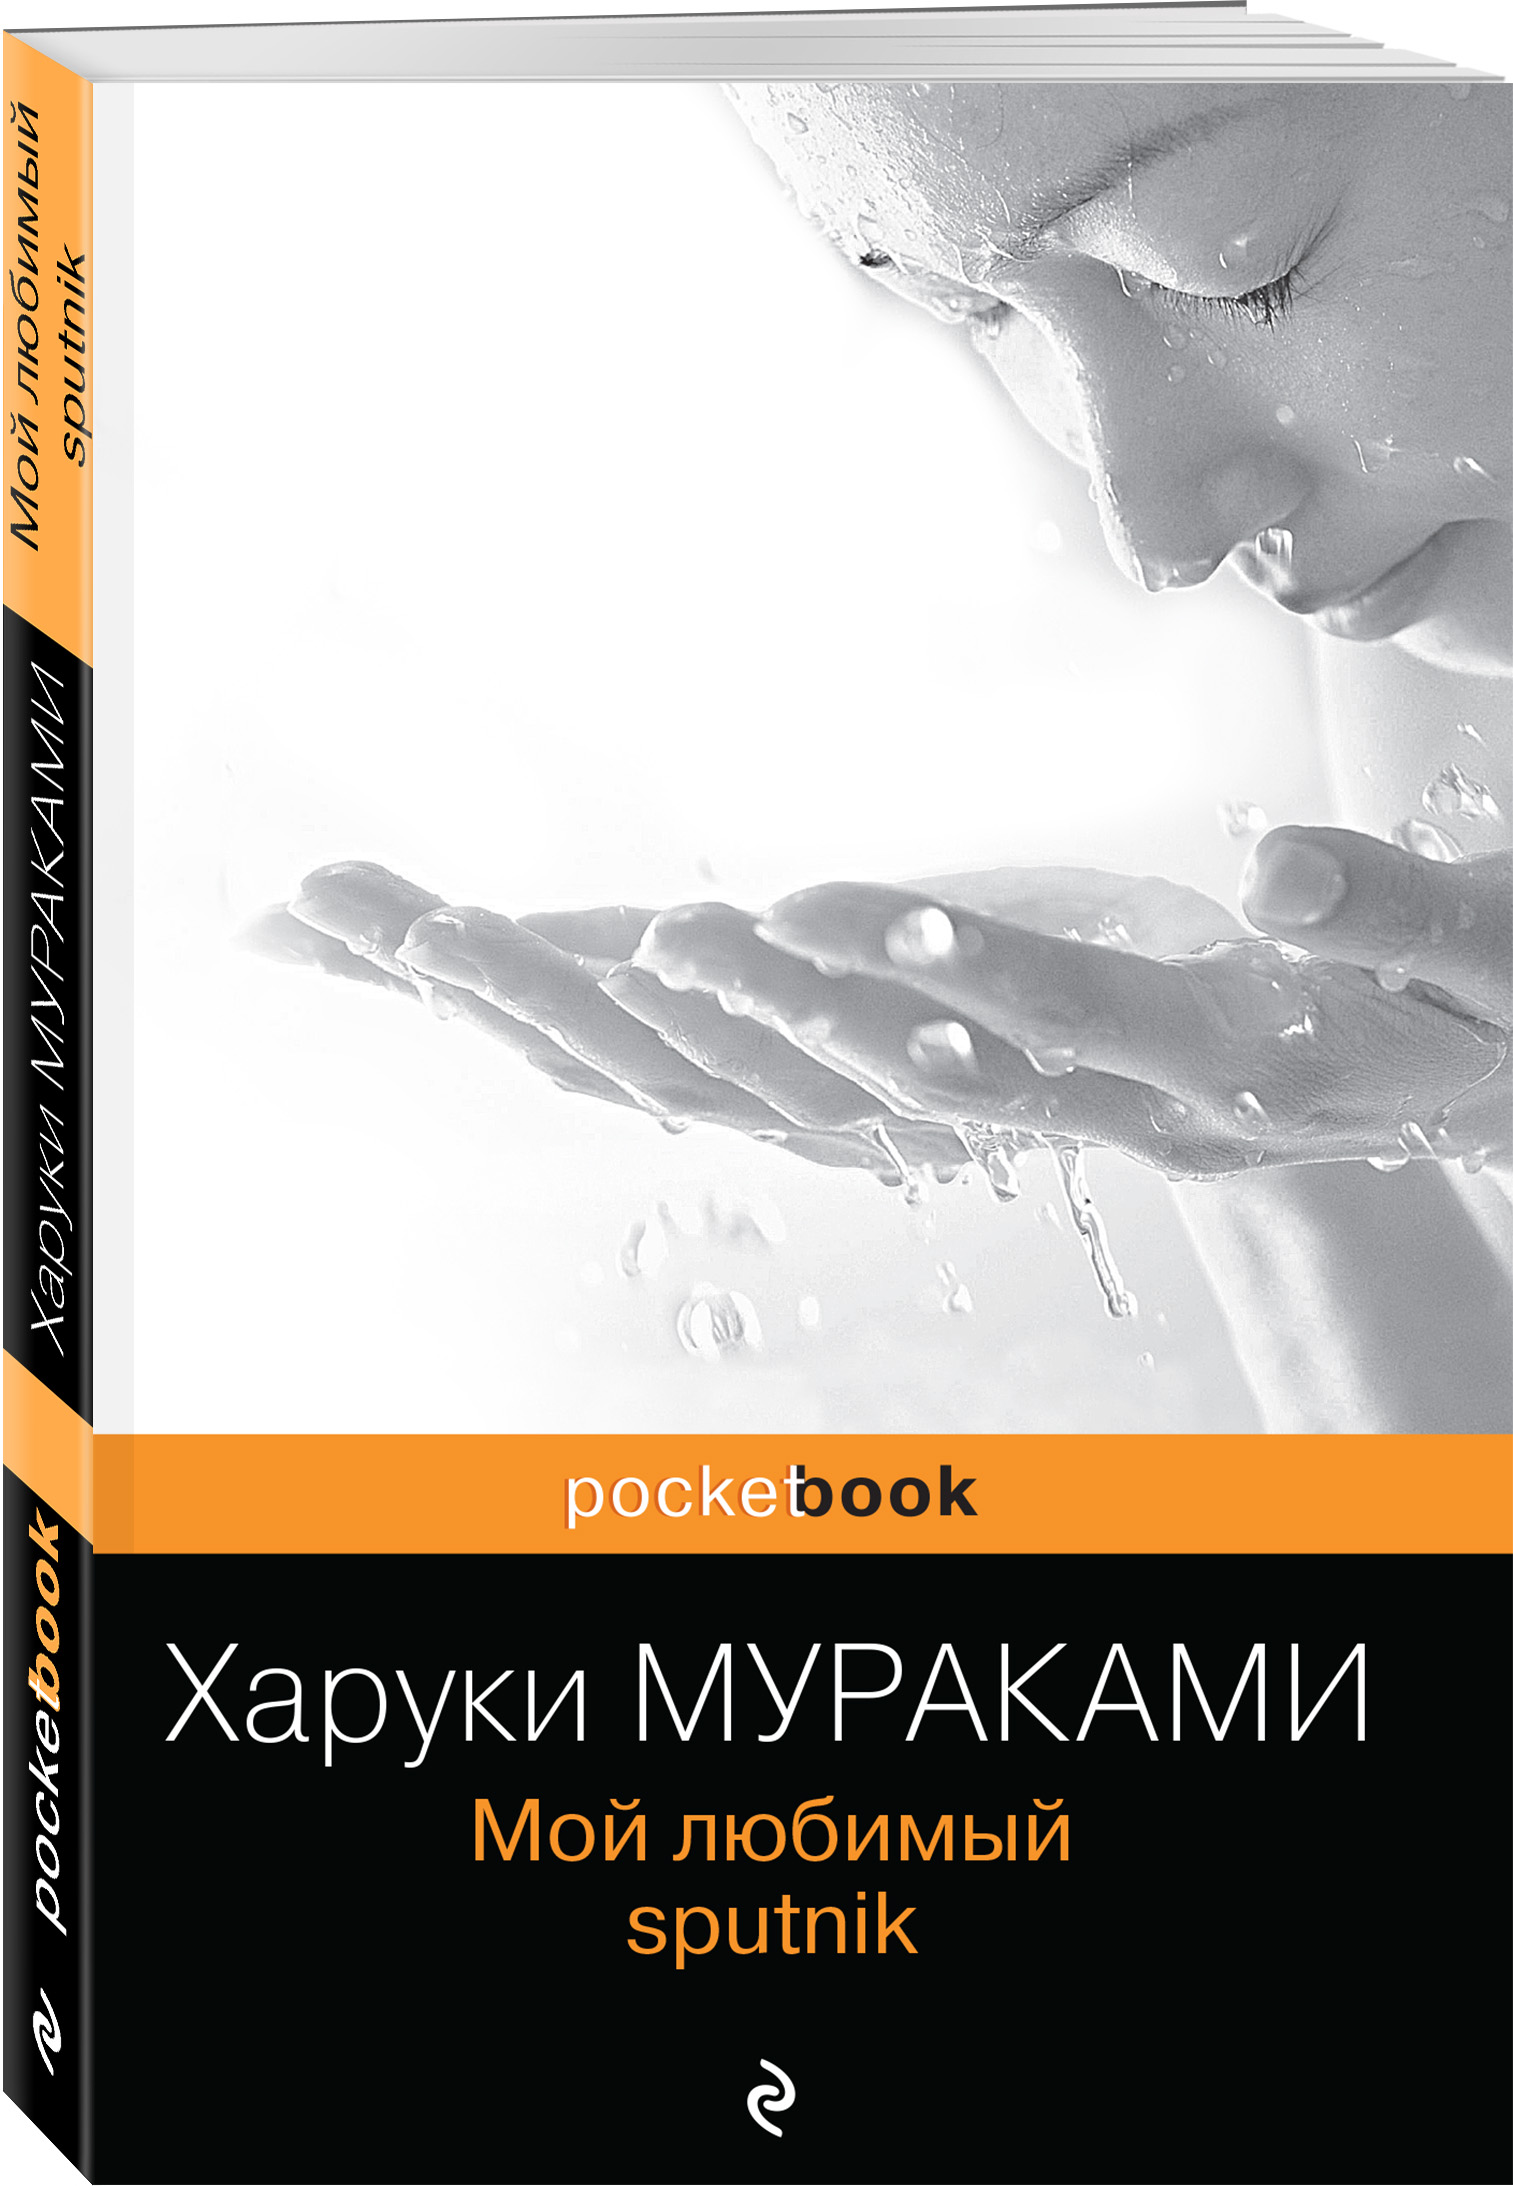 Харуки Мураками Мой любимый sputnik мураками х мой любимый sputnik мягк pocket book мураками х эксмо page 9